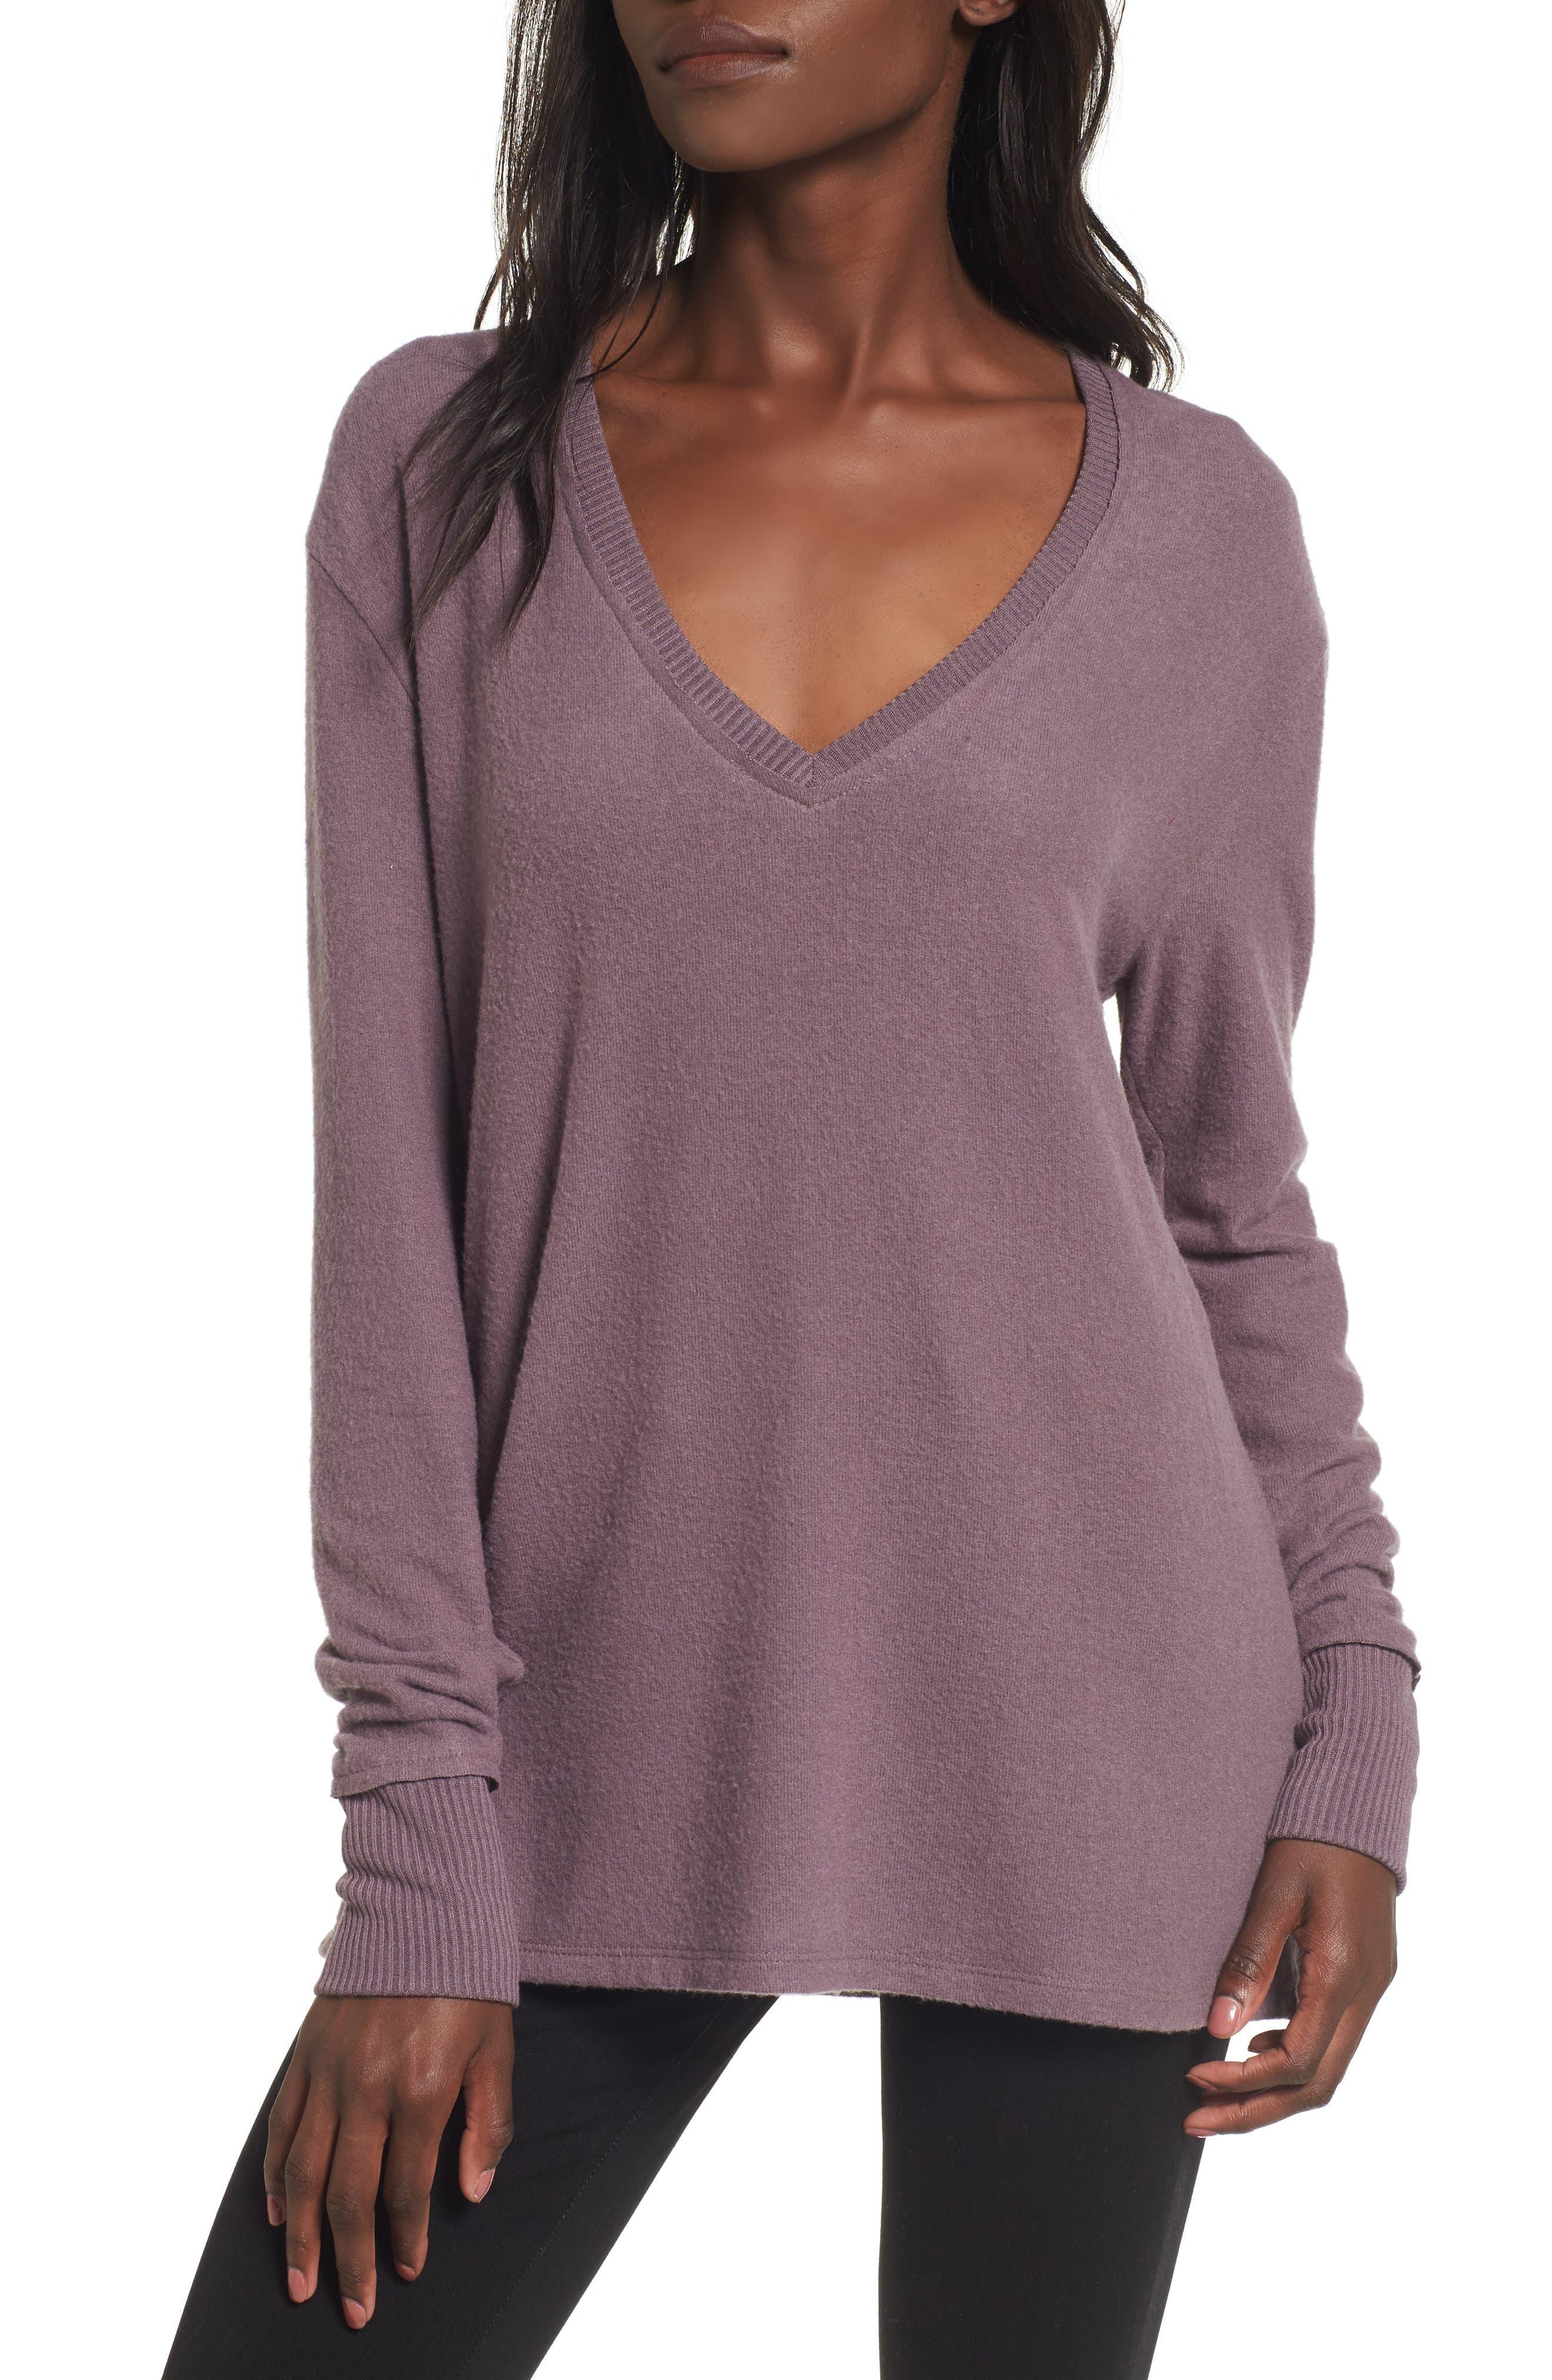 Juniors' & Teens' Sweaters | Nordstrom